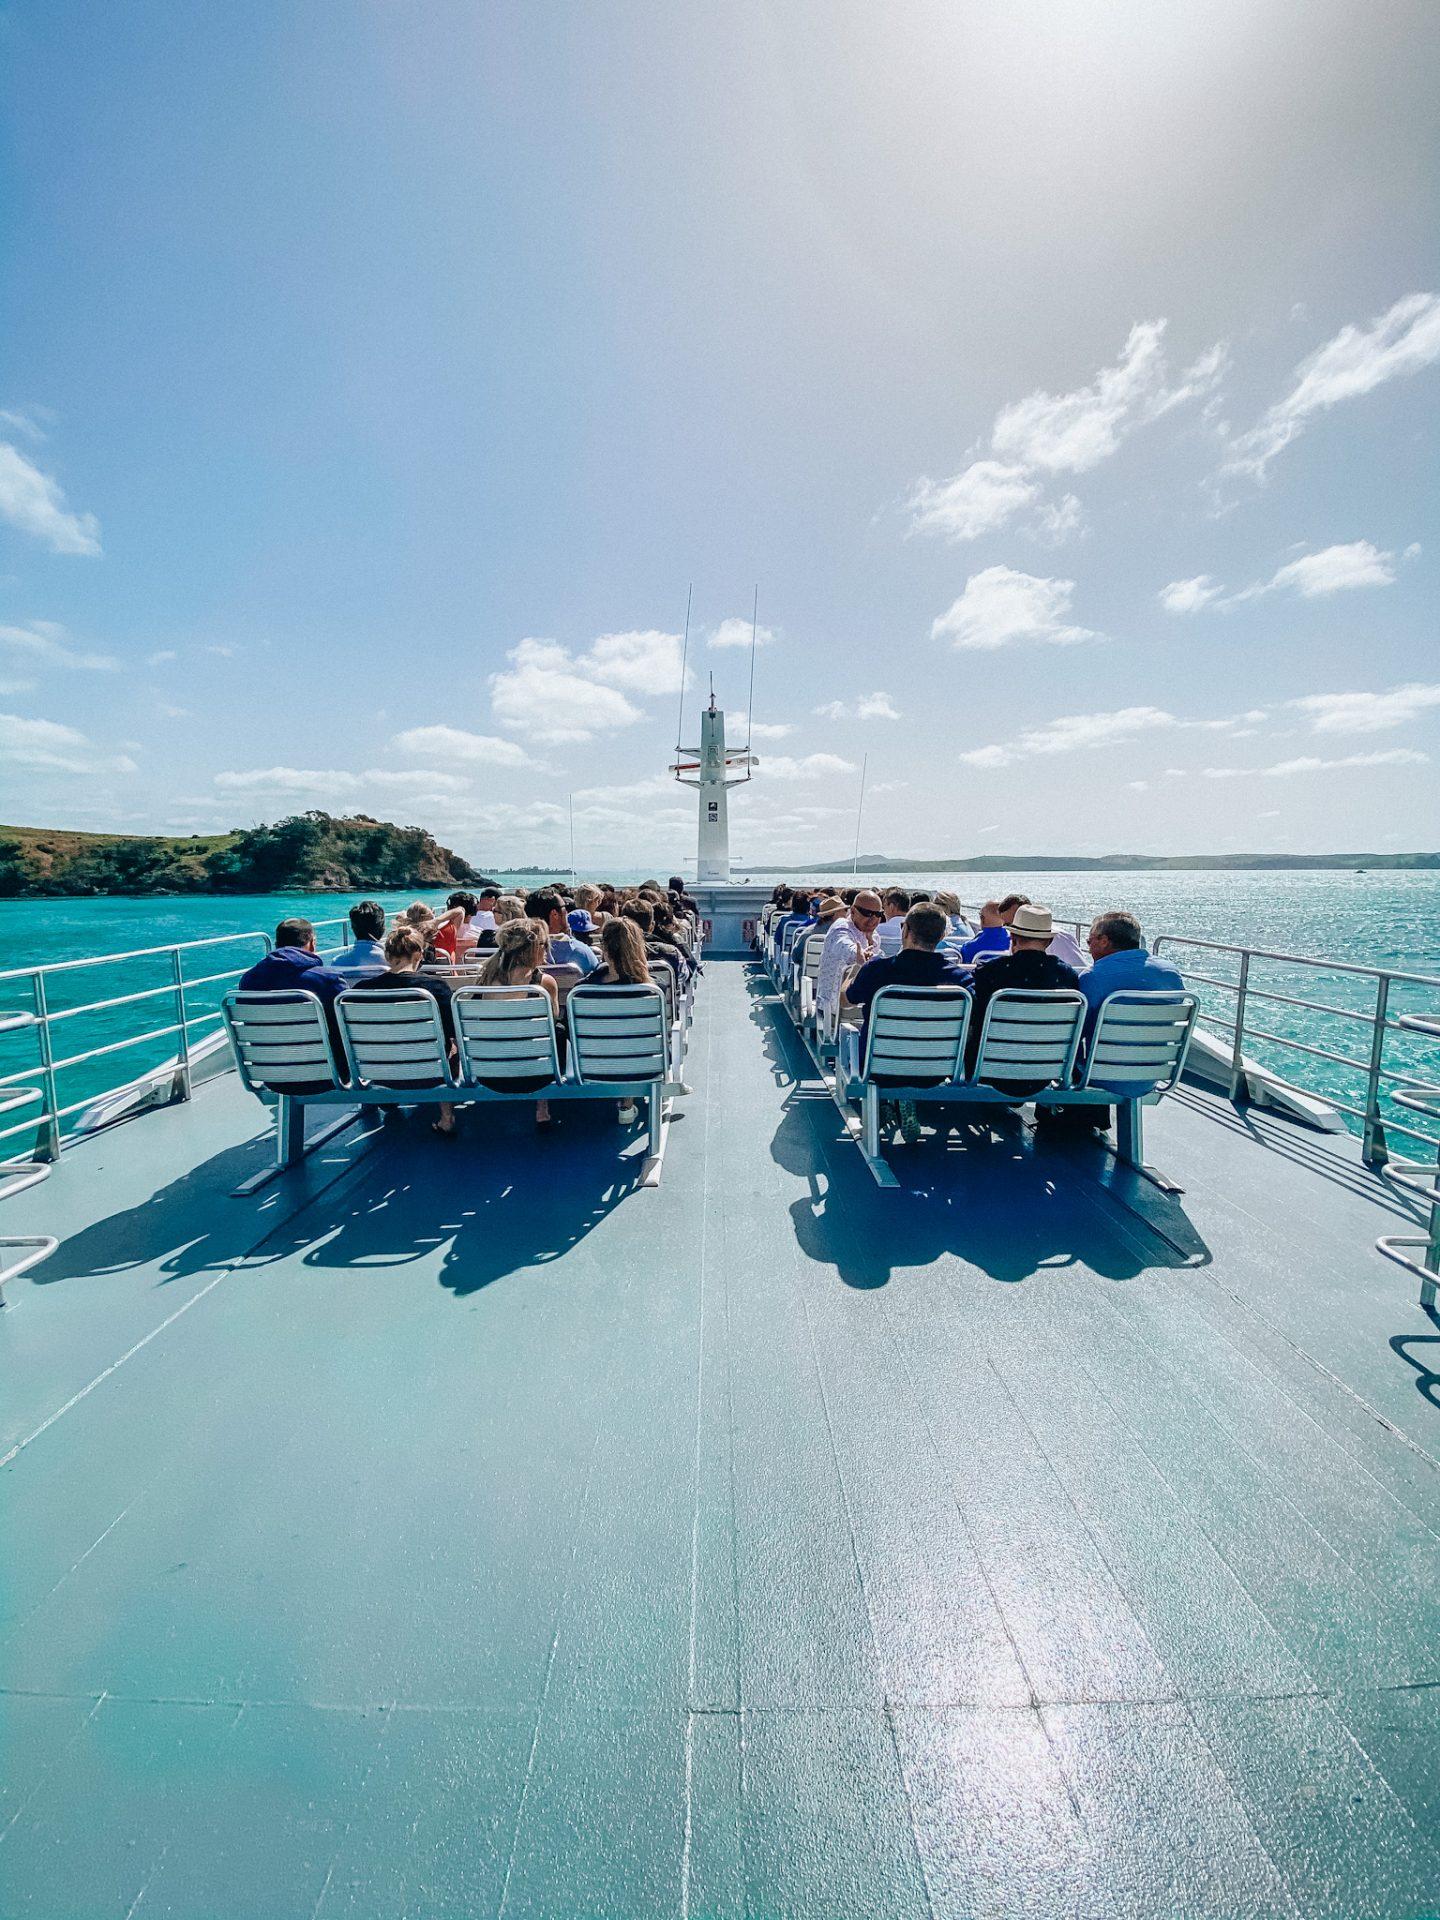 how to get to waiheke island